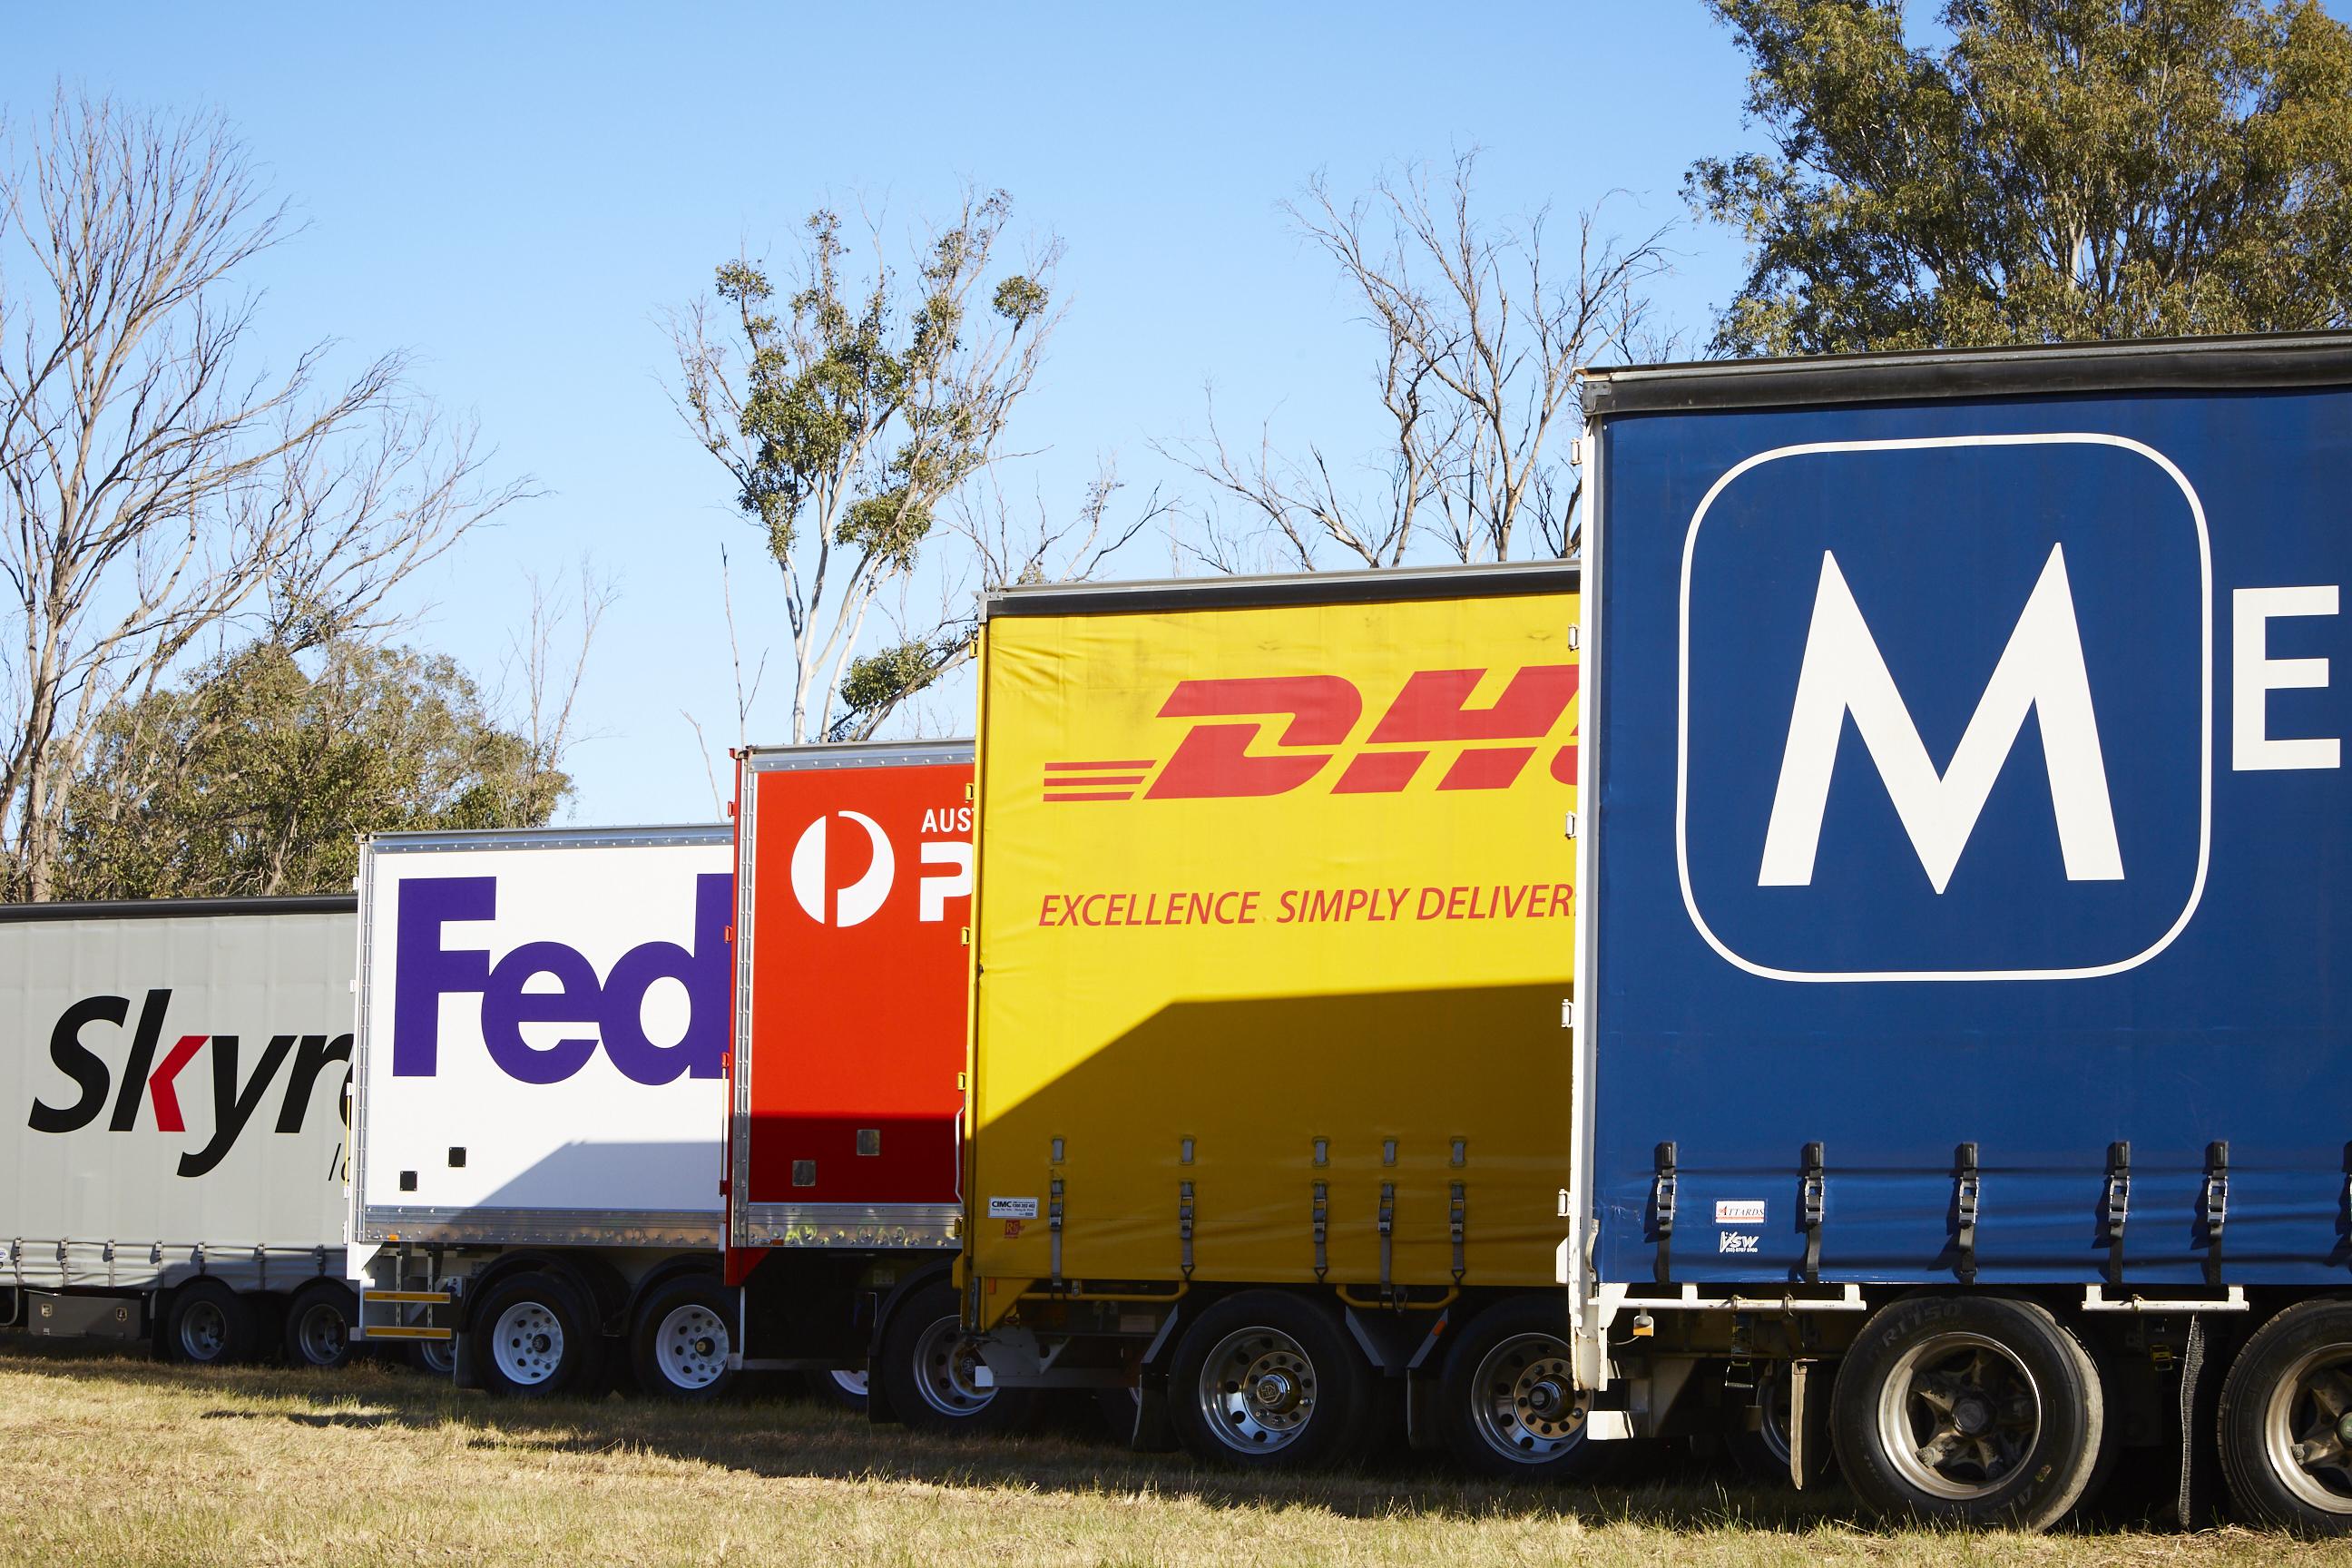 FTA - Freight Trade Alliance